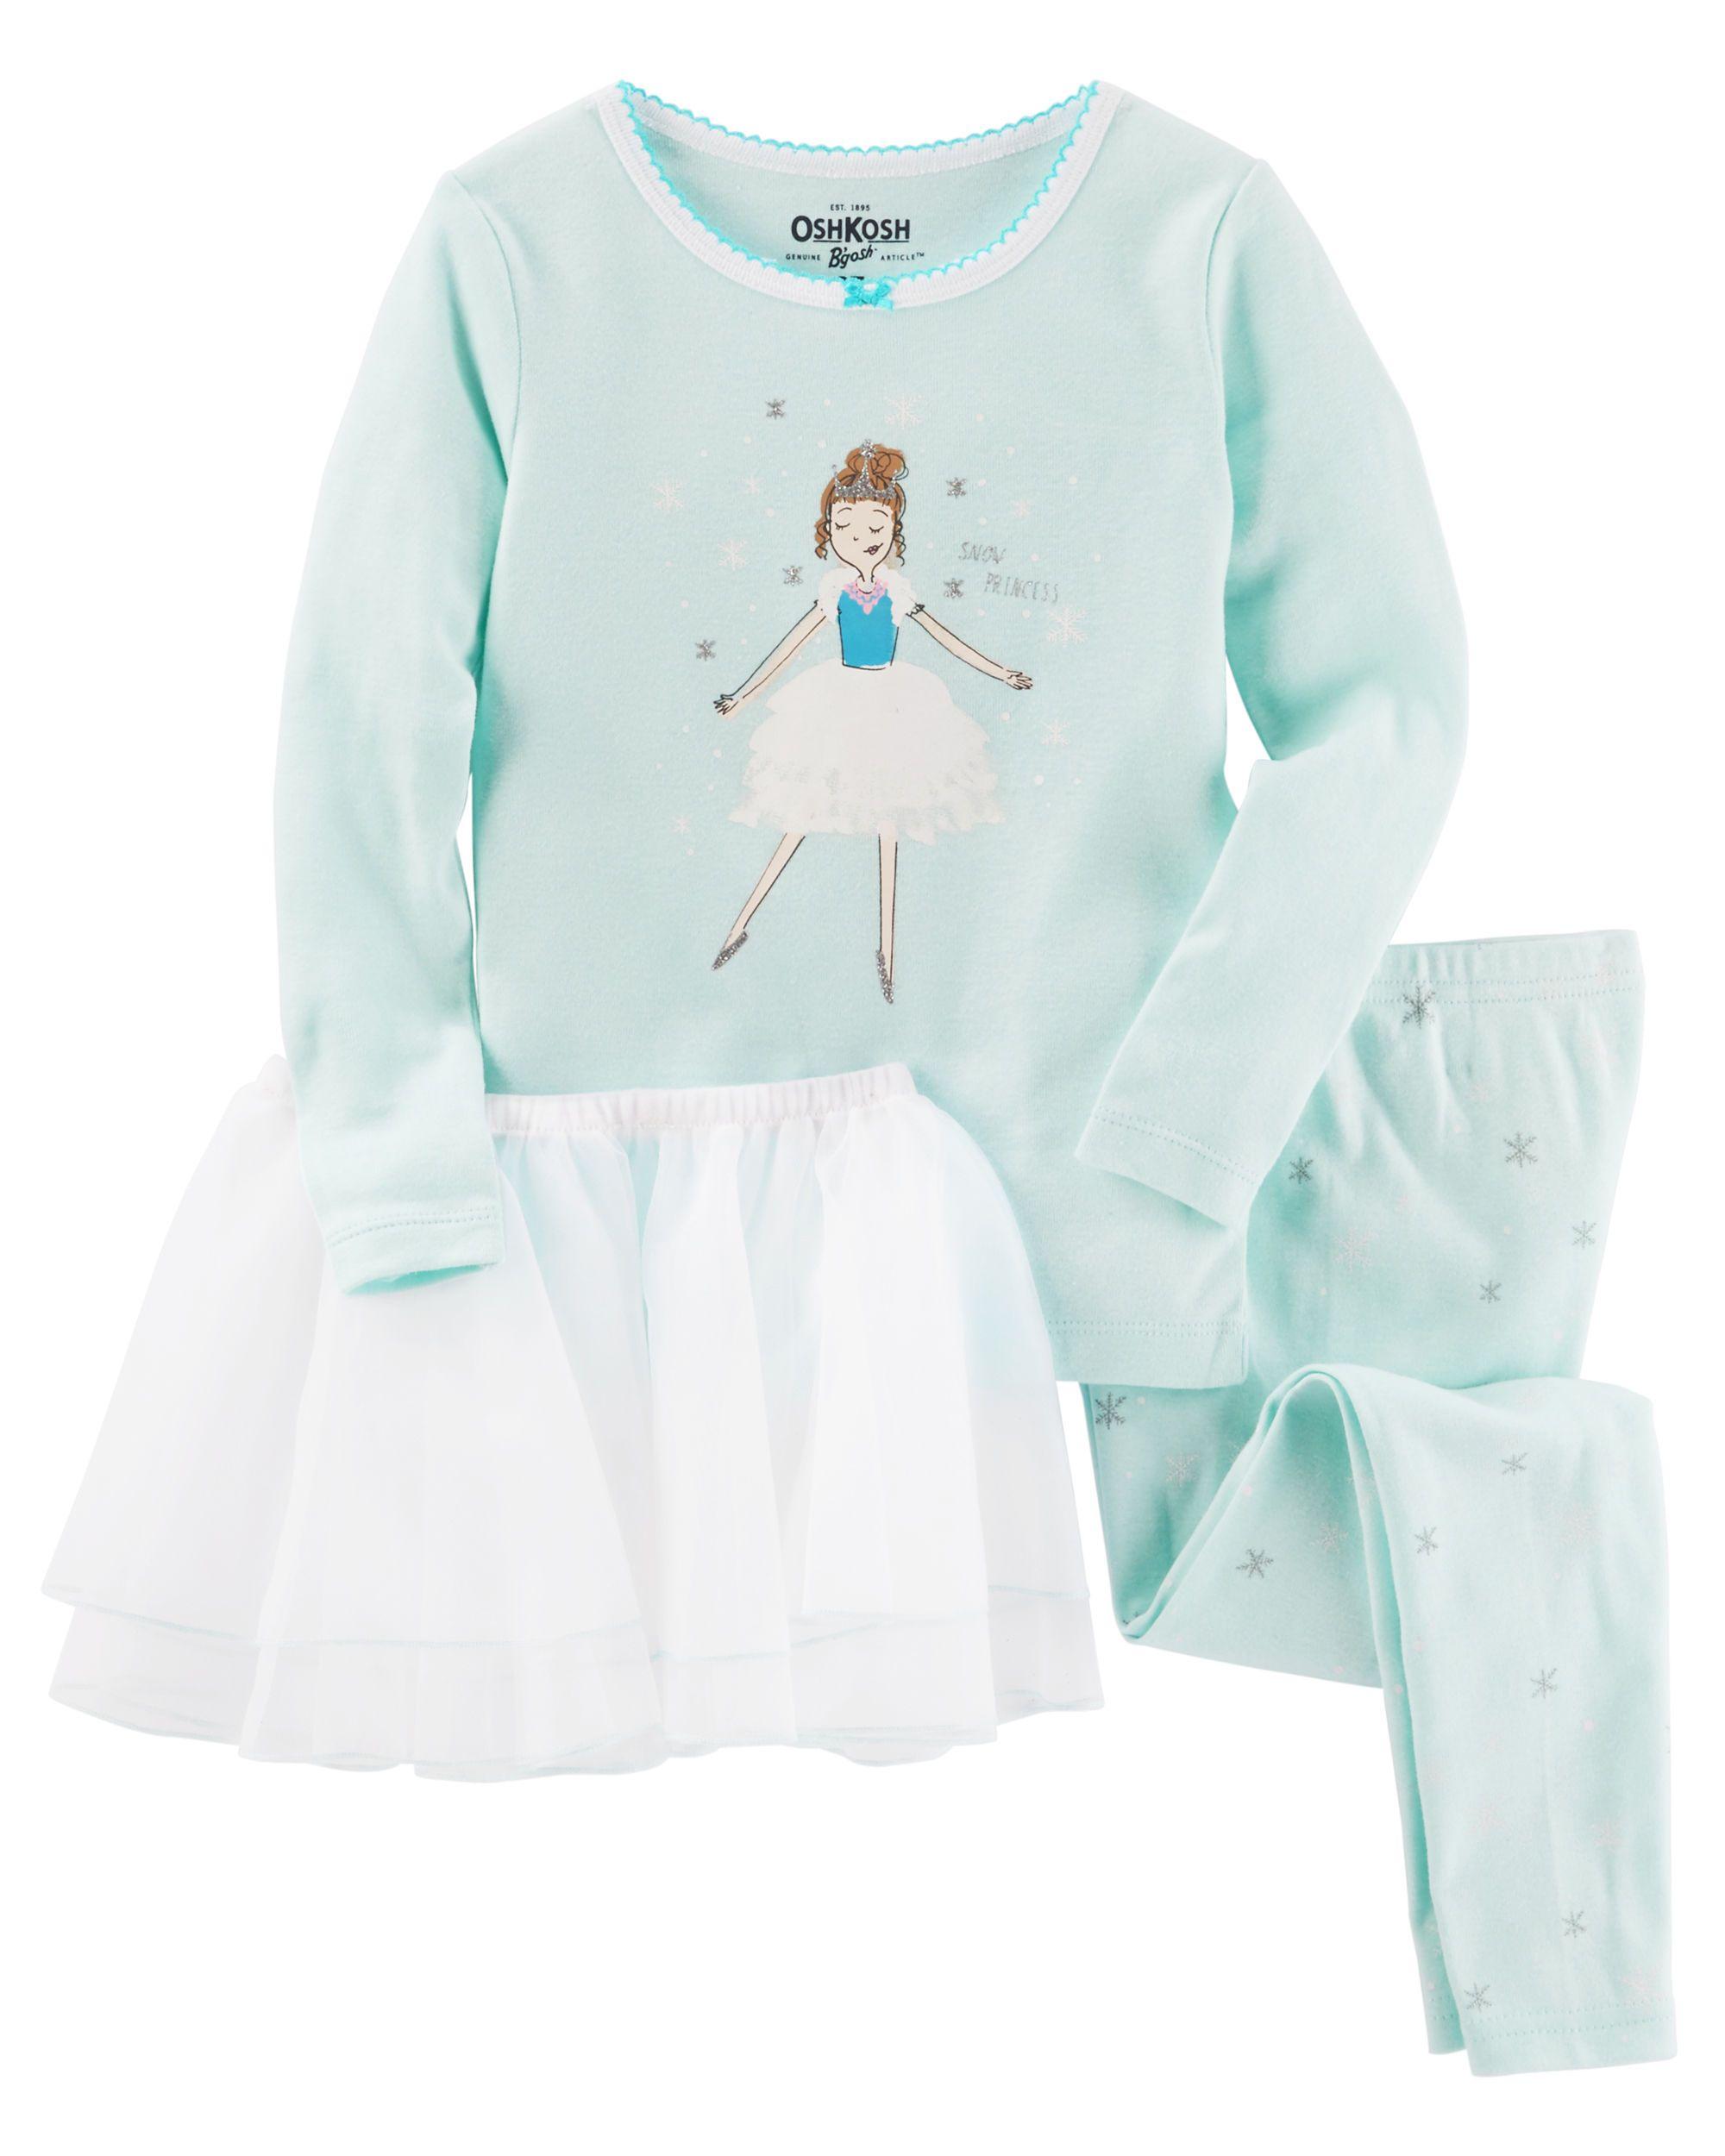 9e70c8083 Baby Girl 3-Piece Ballerina Tutu Cotton PJs from OshKosh B gosh ...